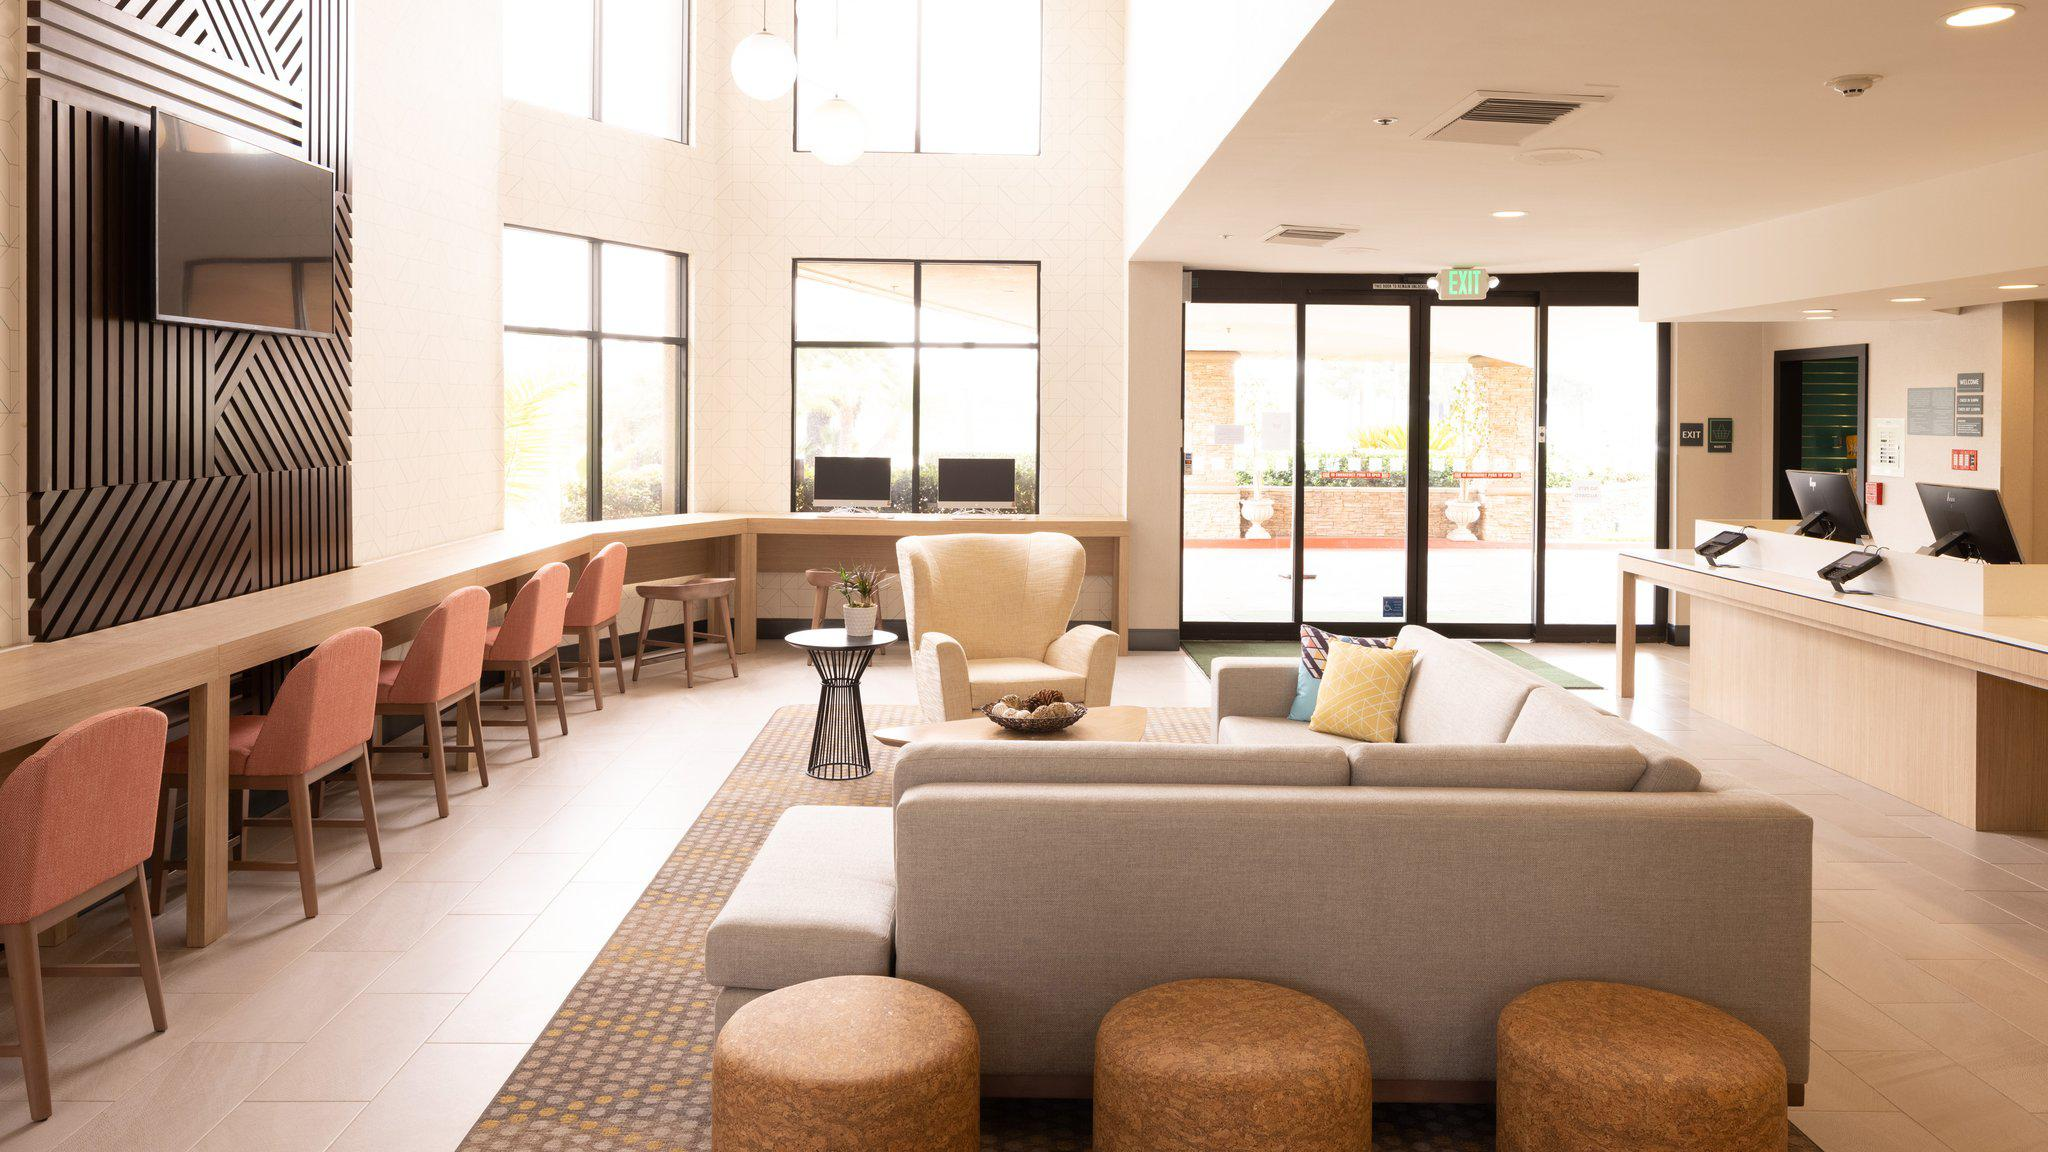 Holiday Inn Santa ANA-Orange Co. Arpt, an IHG Hotel